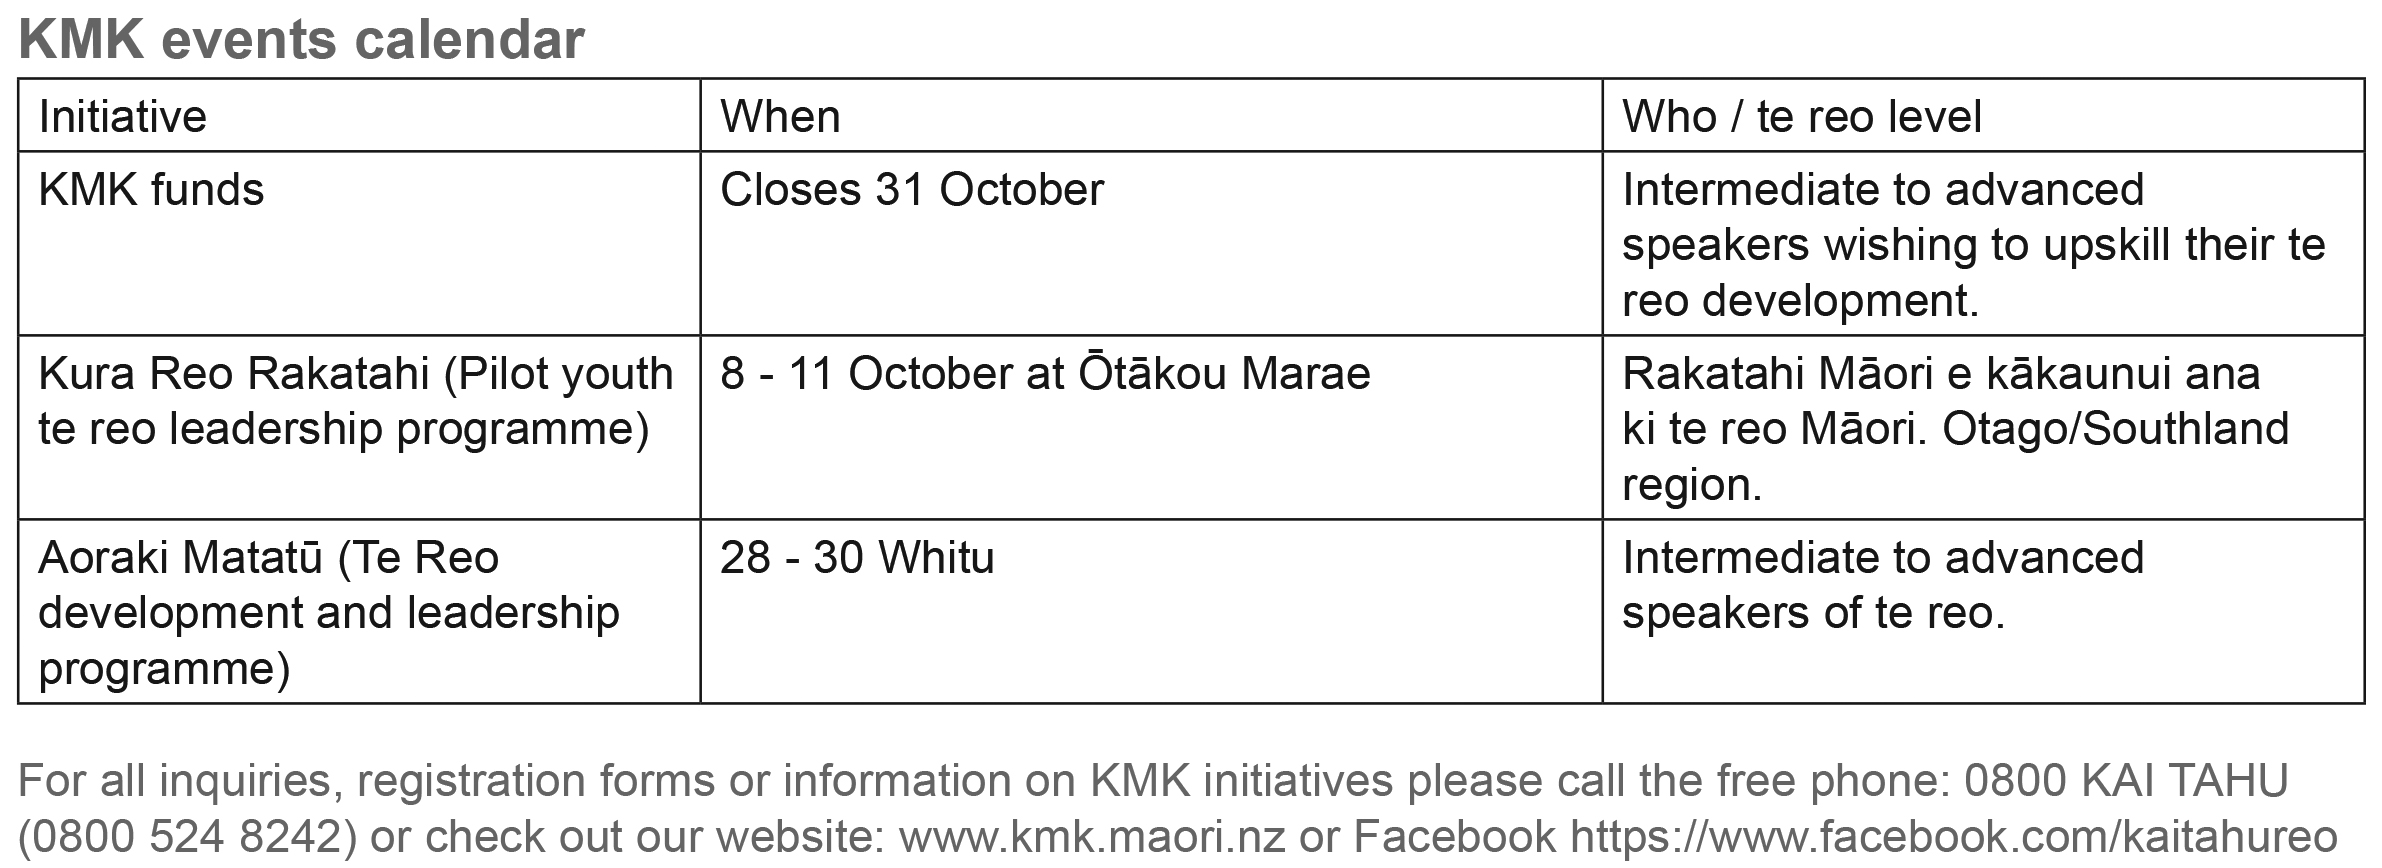 kmk Events Calendar Sept issue